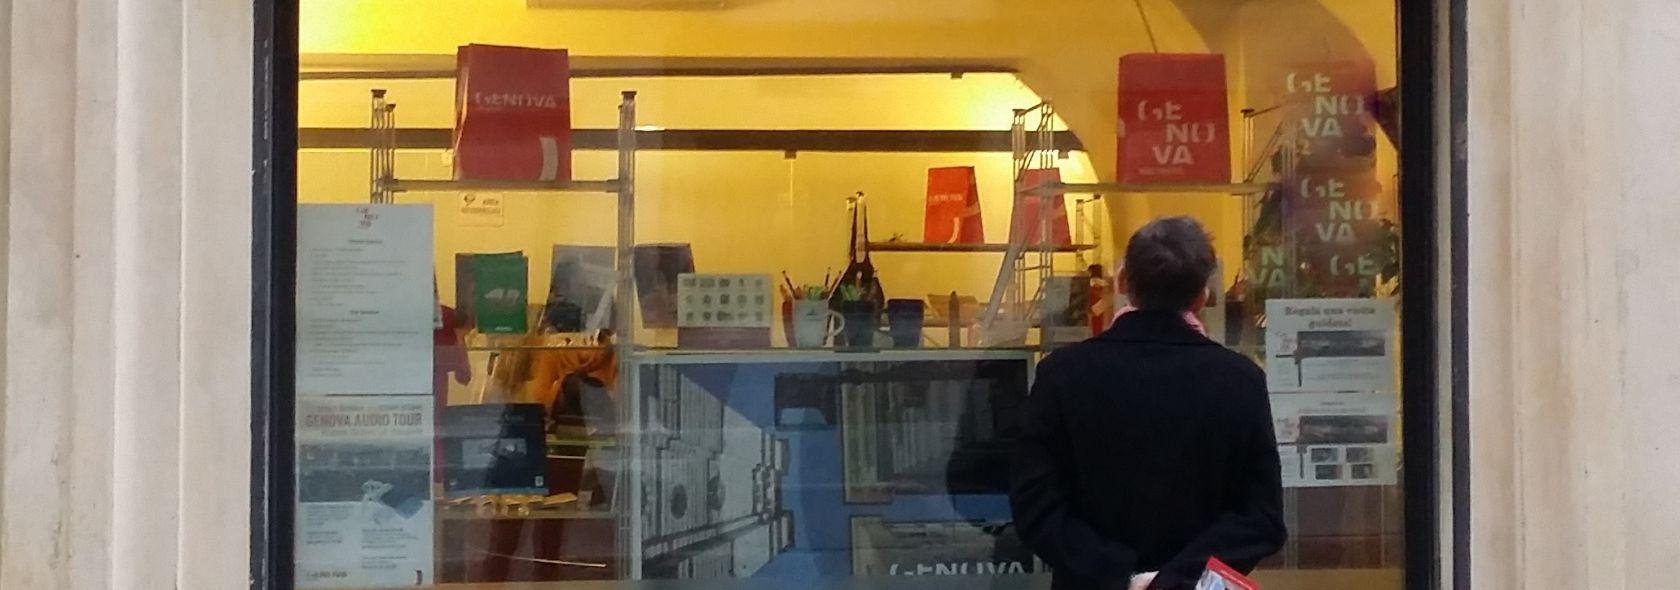 Oficinas de turismo